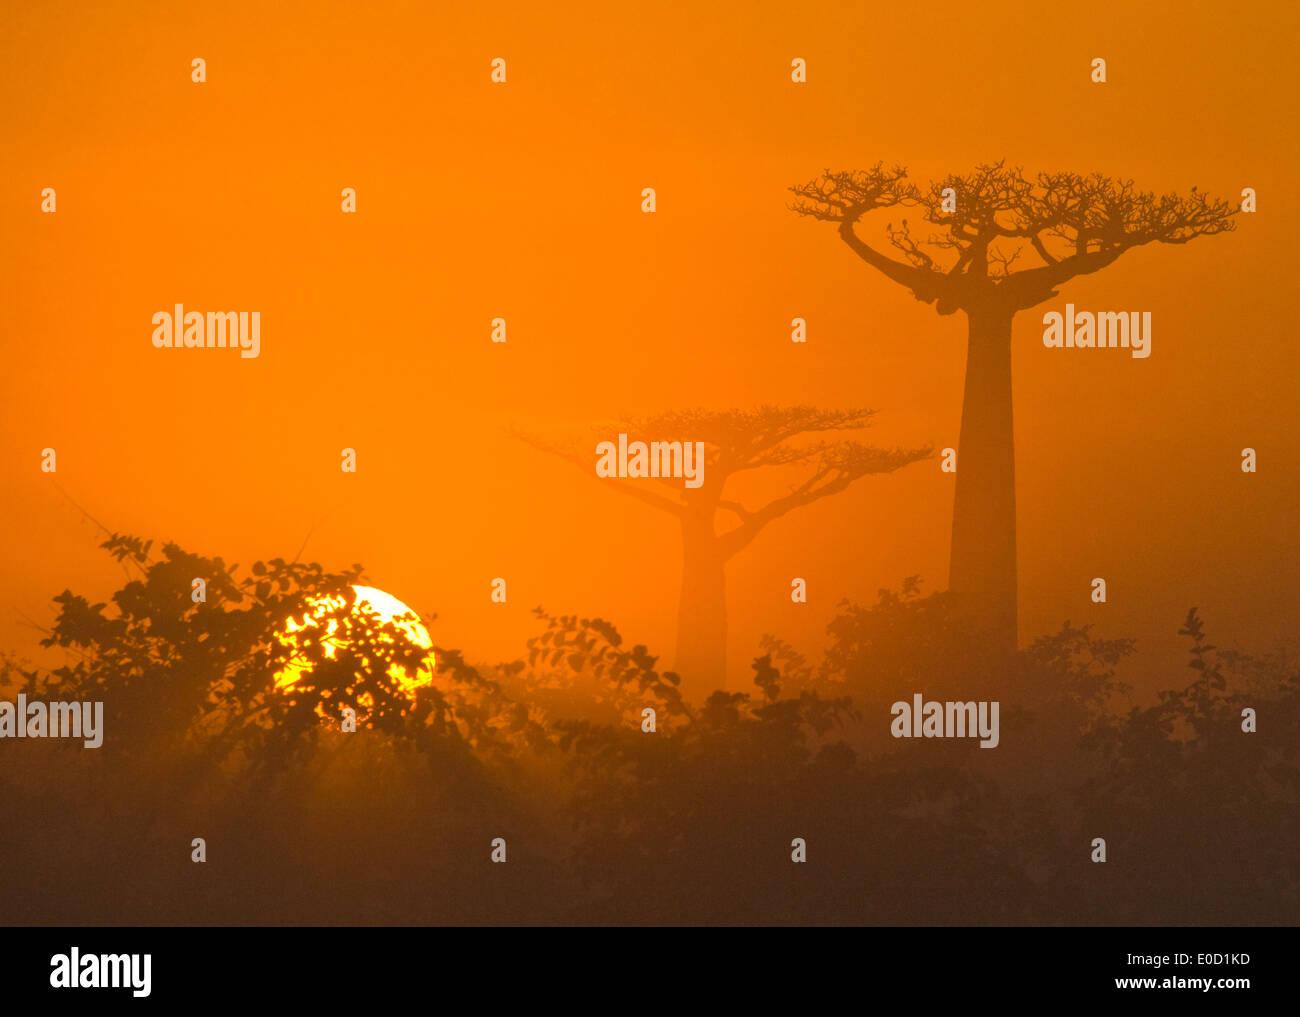 Madagascan baobab in the morning sunlight, Madagscar (Adansonia digitata) - Stock Image